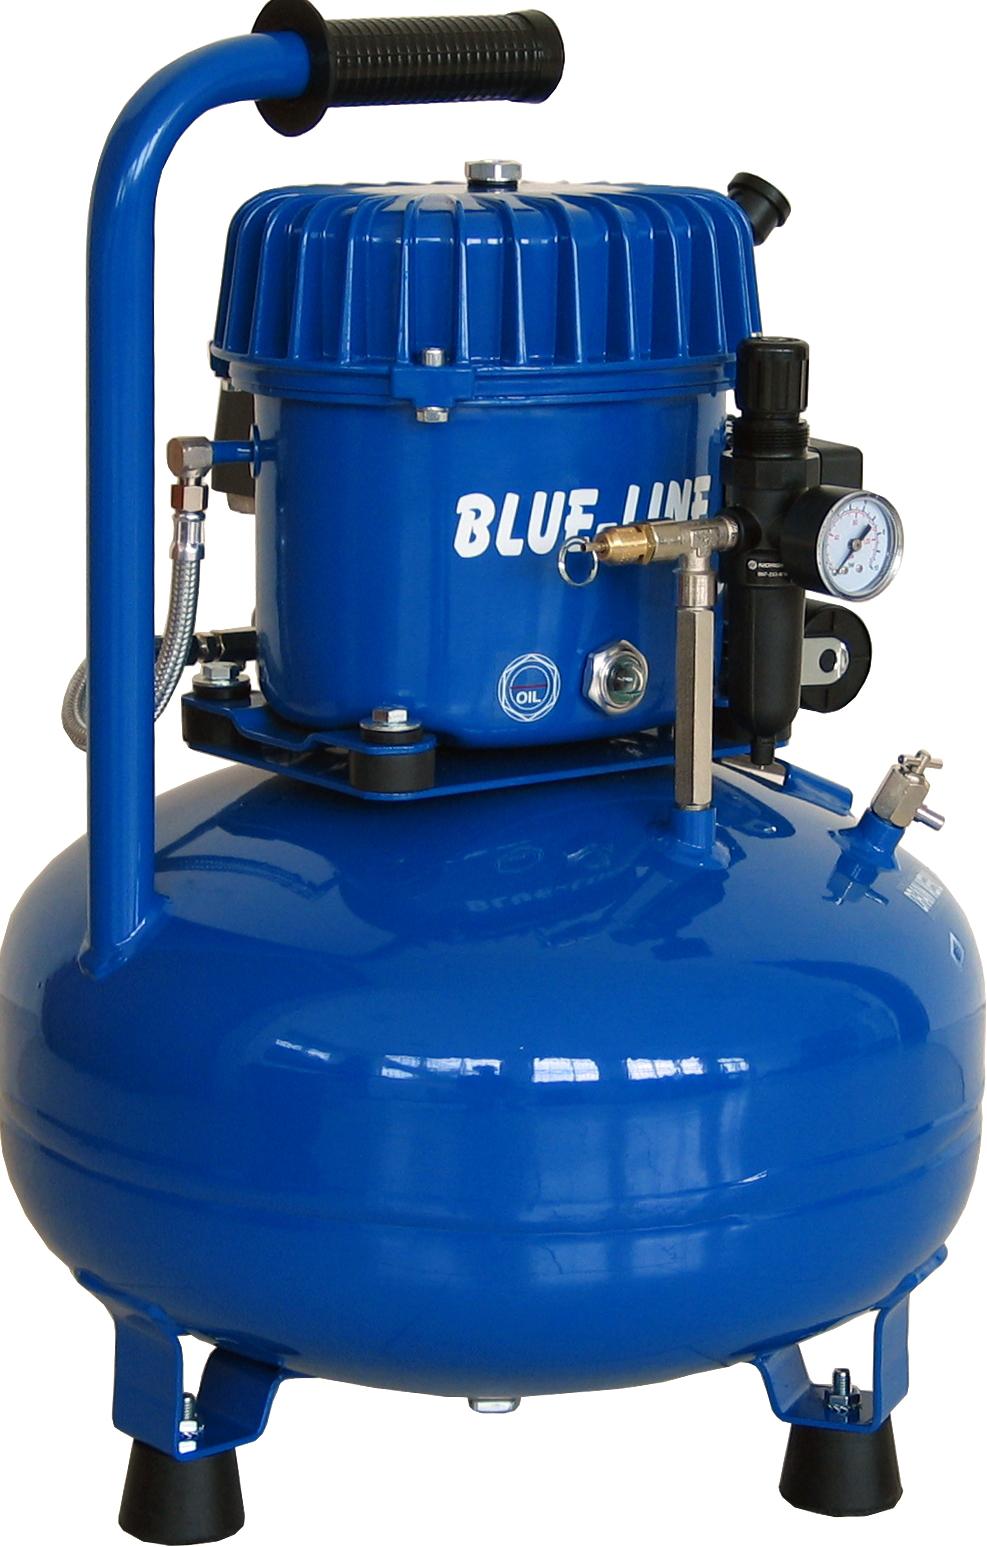 Compressor Blue-Line L-B50-25